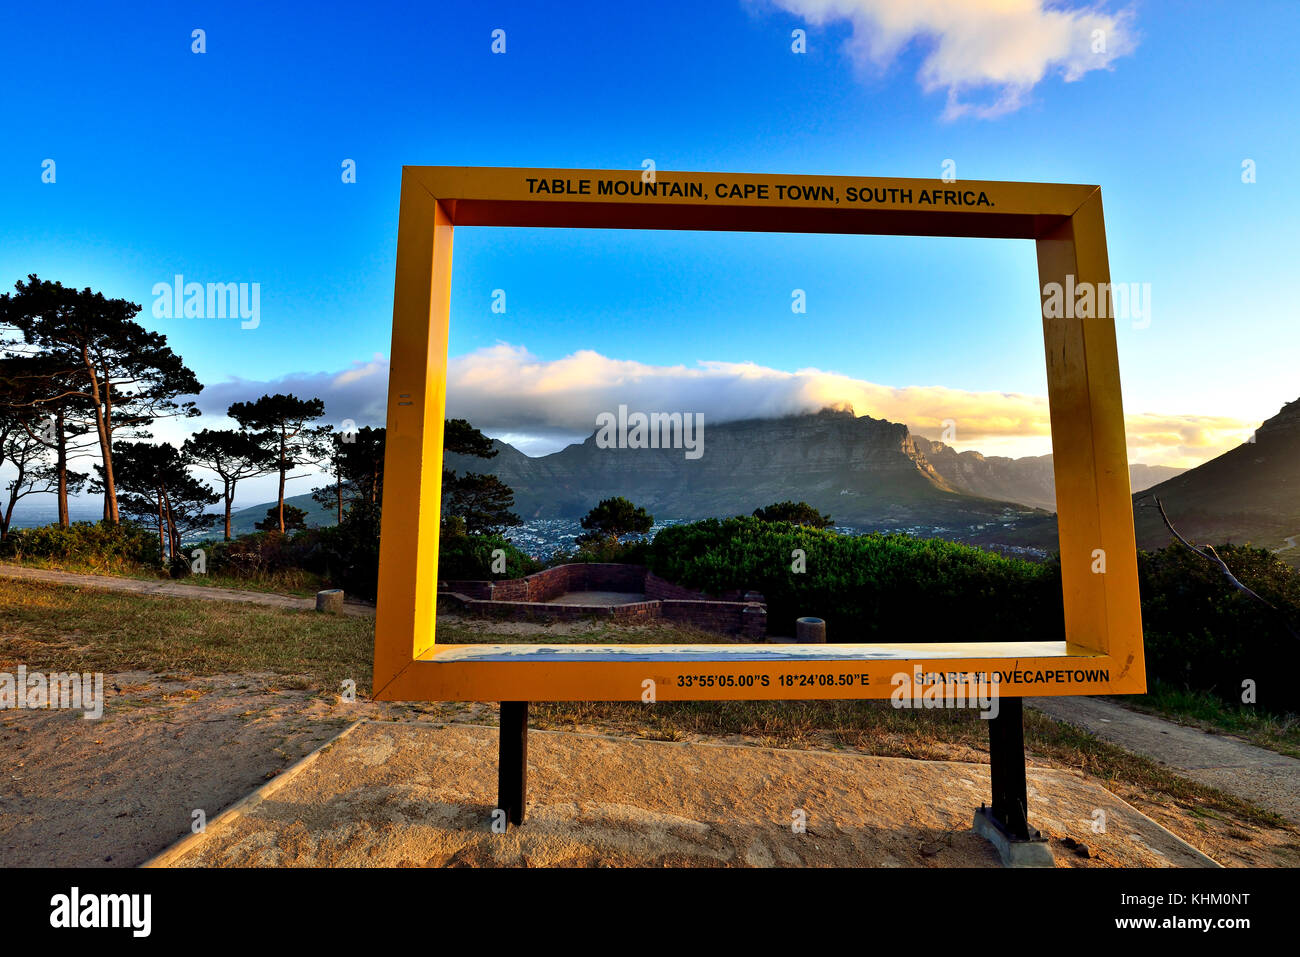 Table Mountain Frame Stock Photos & Table Mountain Frame Stock ...